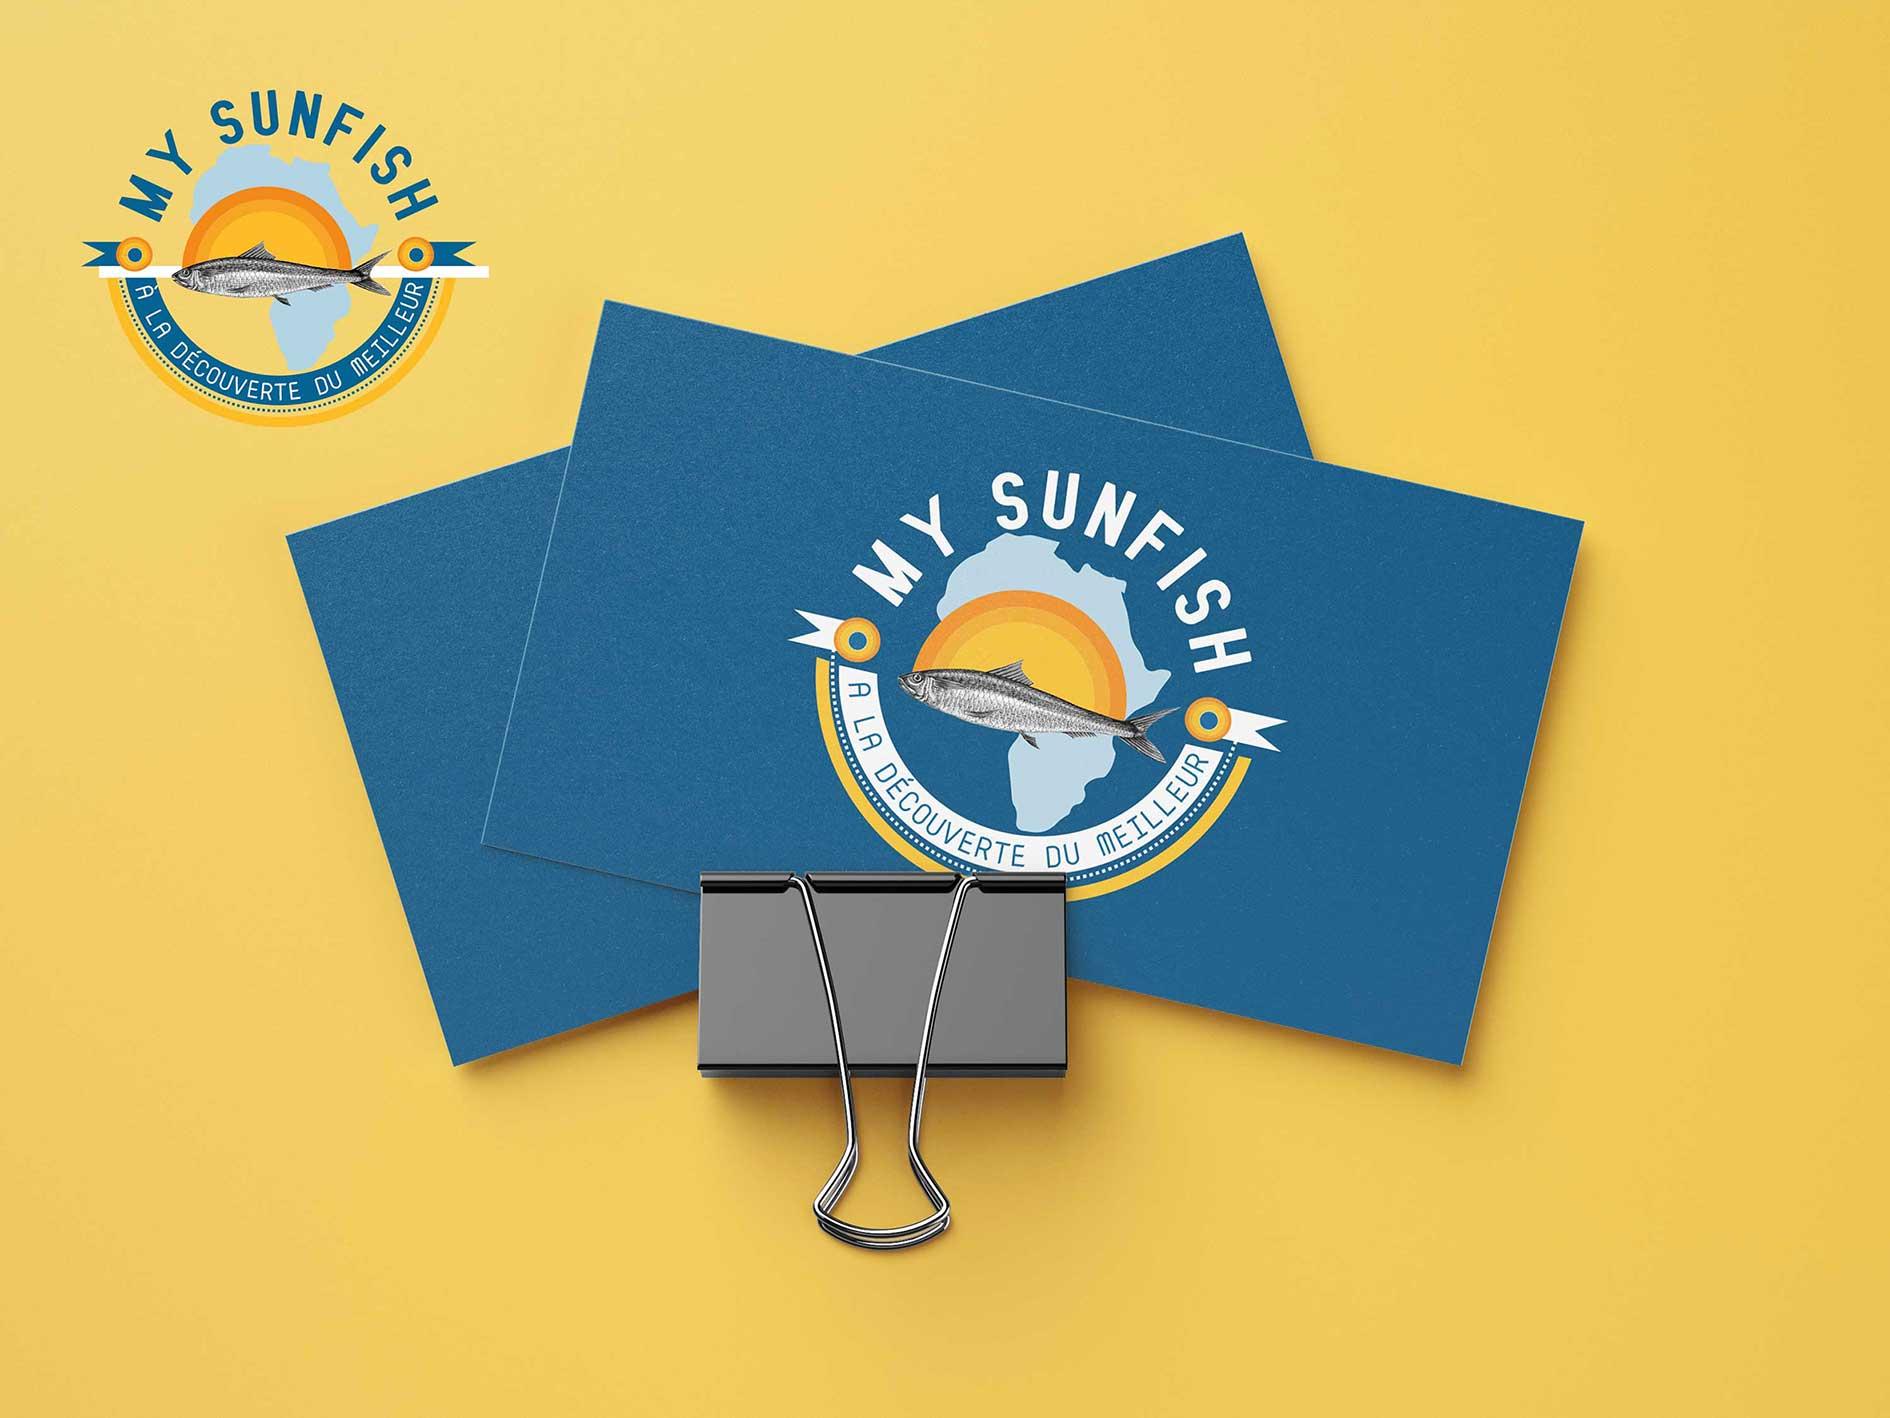 logo-mysunfish-skoncommunication-logo-mysunfish-skoncommunication-logo-mysunfish-skoncommunication-saintjeandeluz-crevettessechees-crevettes-concerverie-ocean